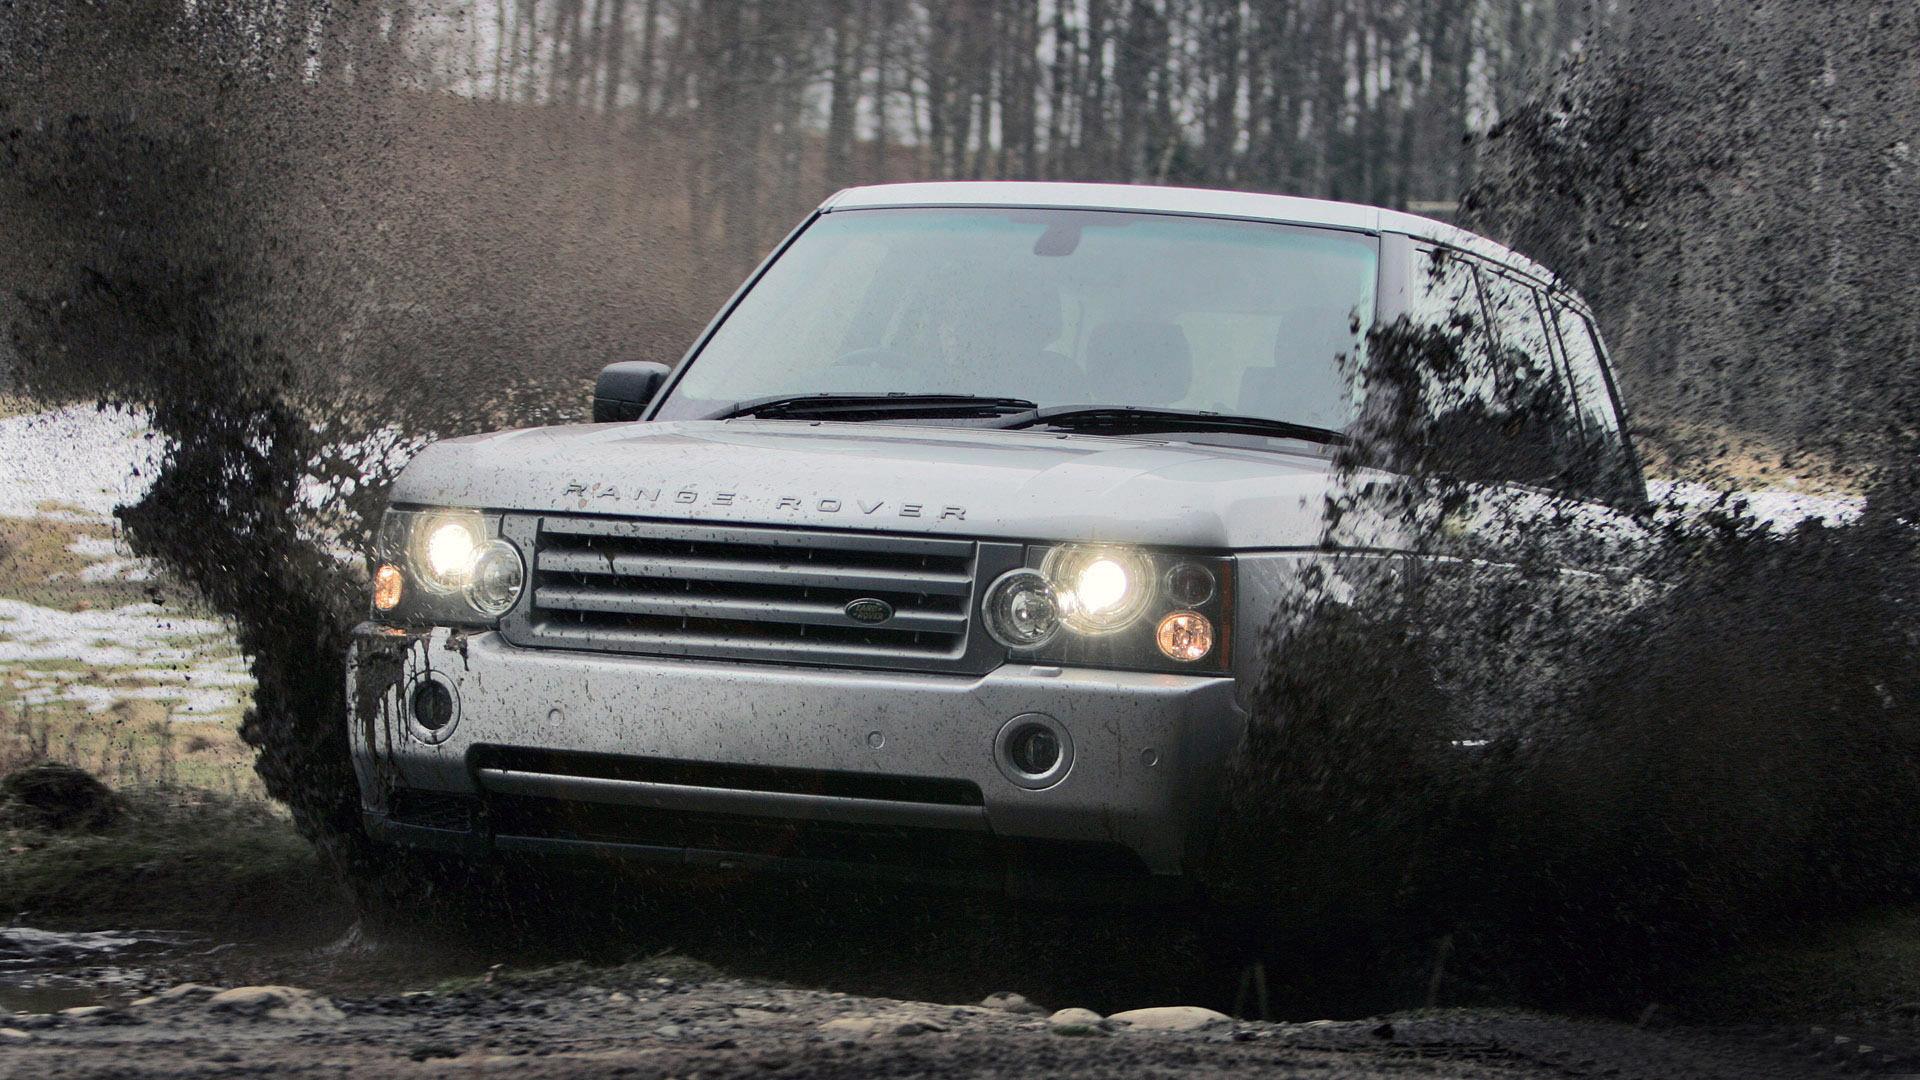 [47+] Land Rover Wallpapers On WallpaperSafari